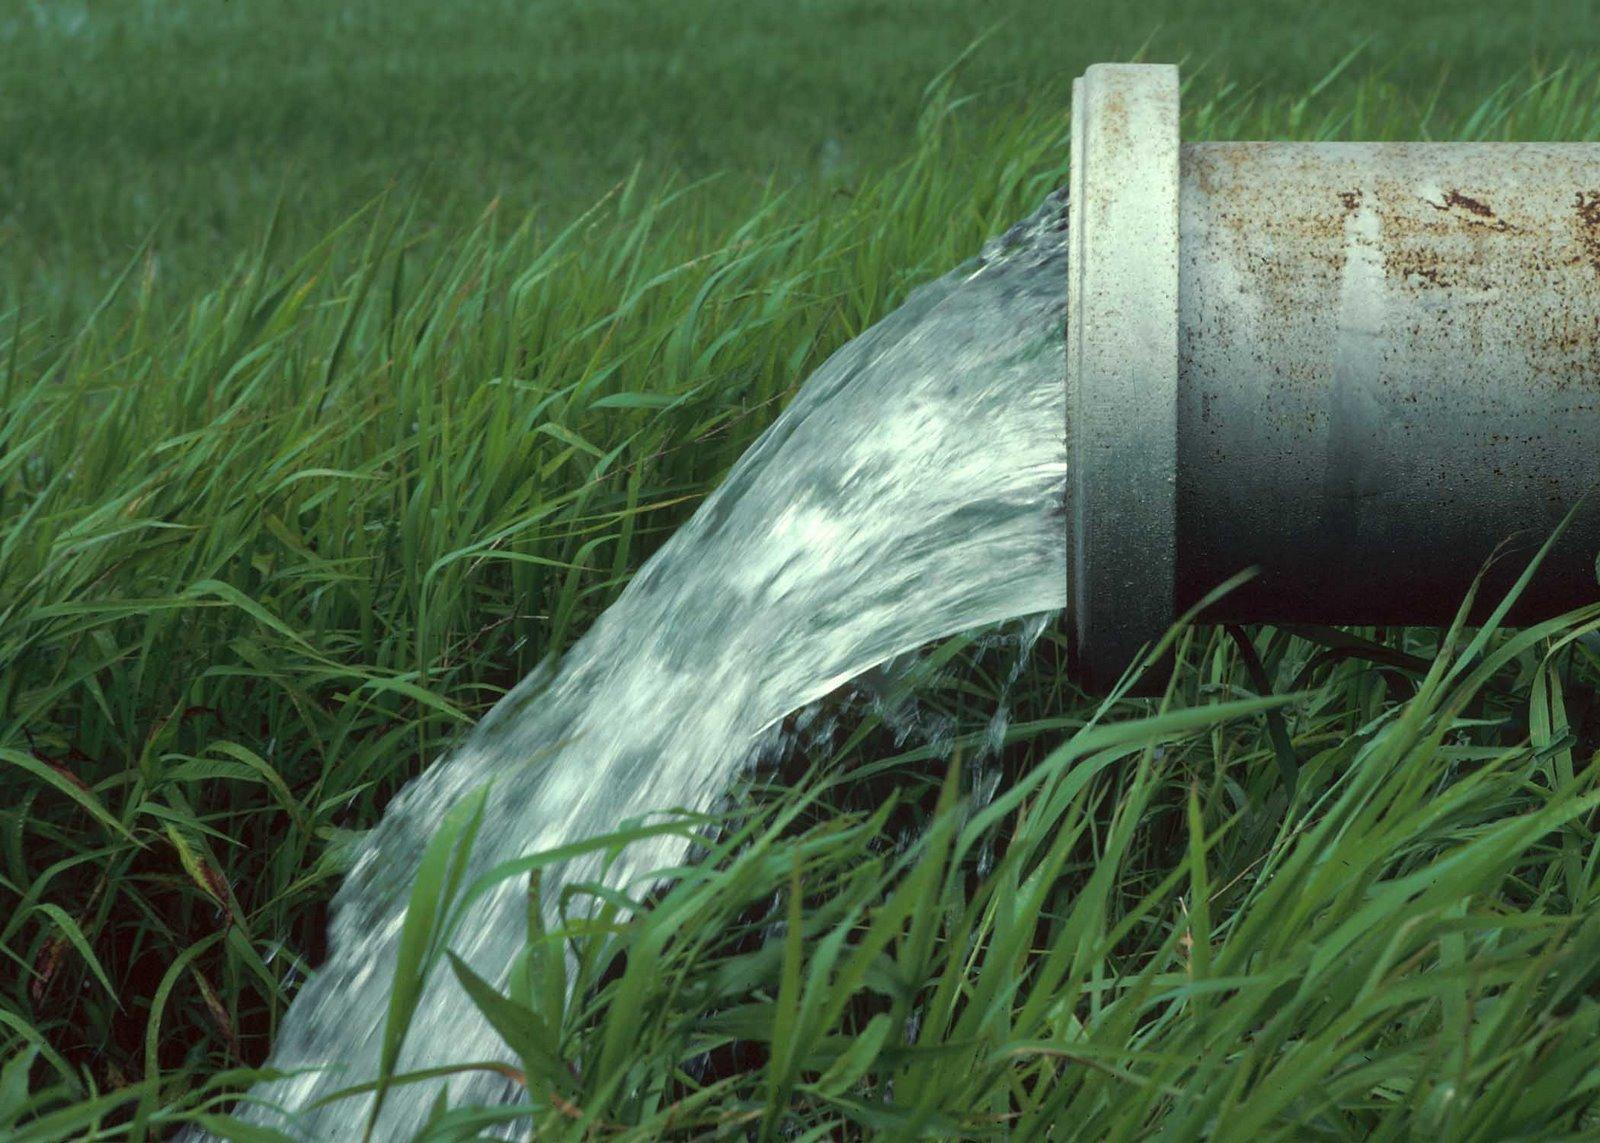 water-conservation-1-731747.jpg